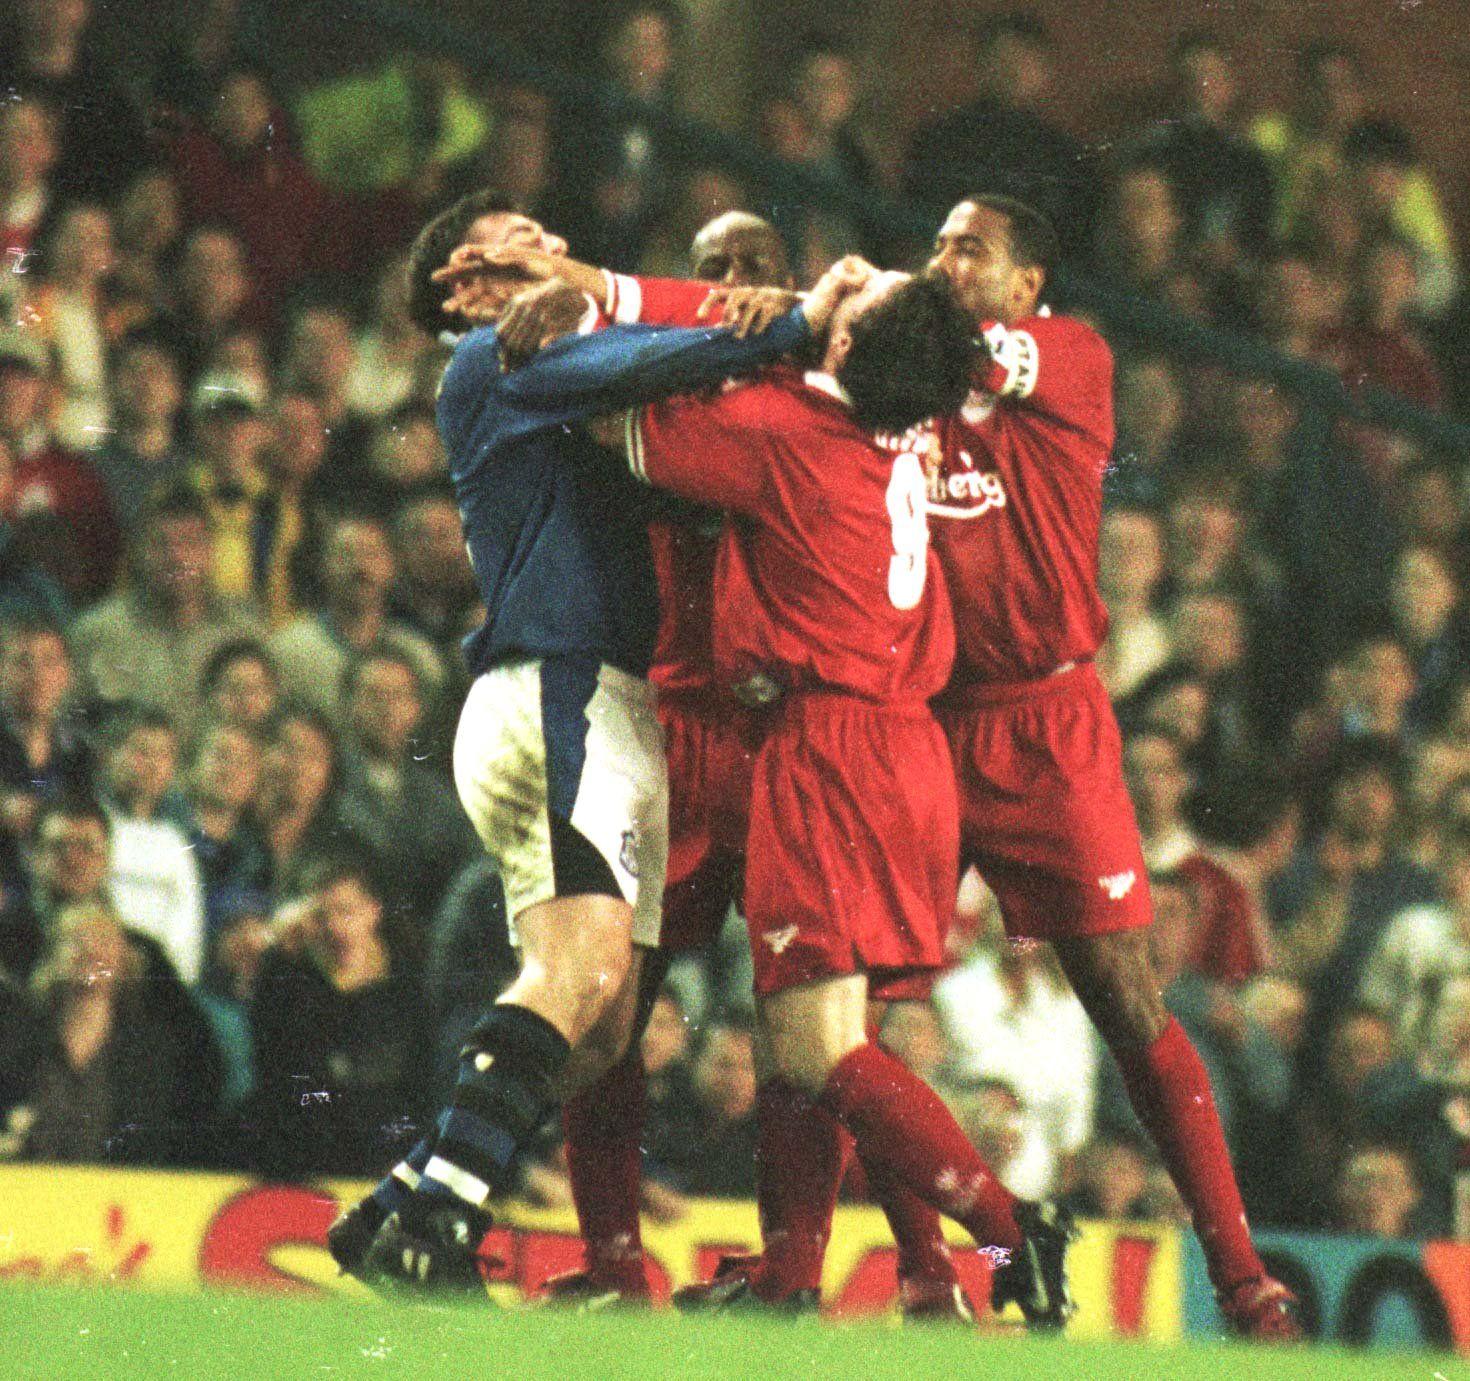 TØFFE TAK: Det er ikke noe kjære mor i Merseyside-derbyet. Det beviste David Unsworth (blå) og Robbie Fowler i 1997.